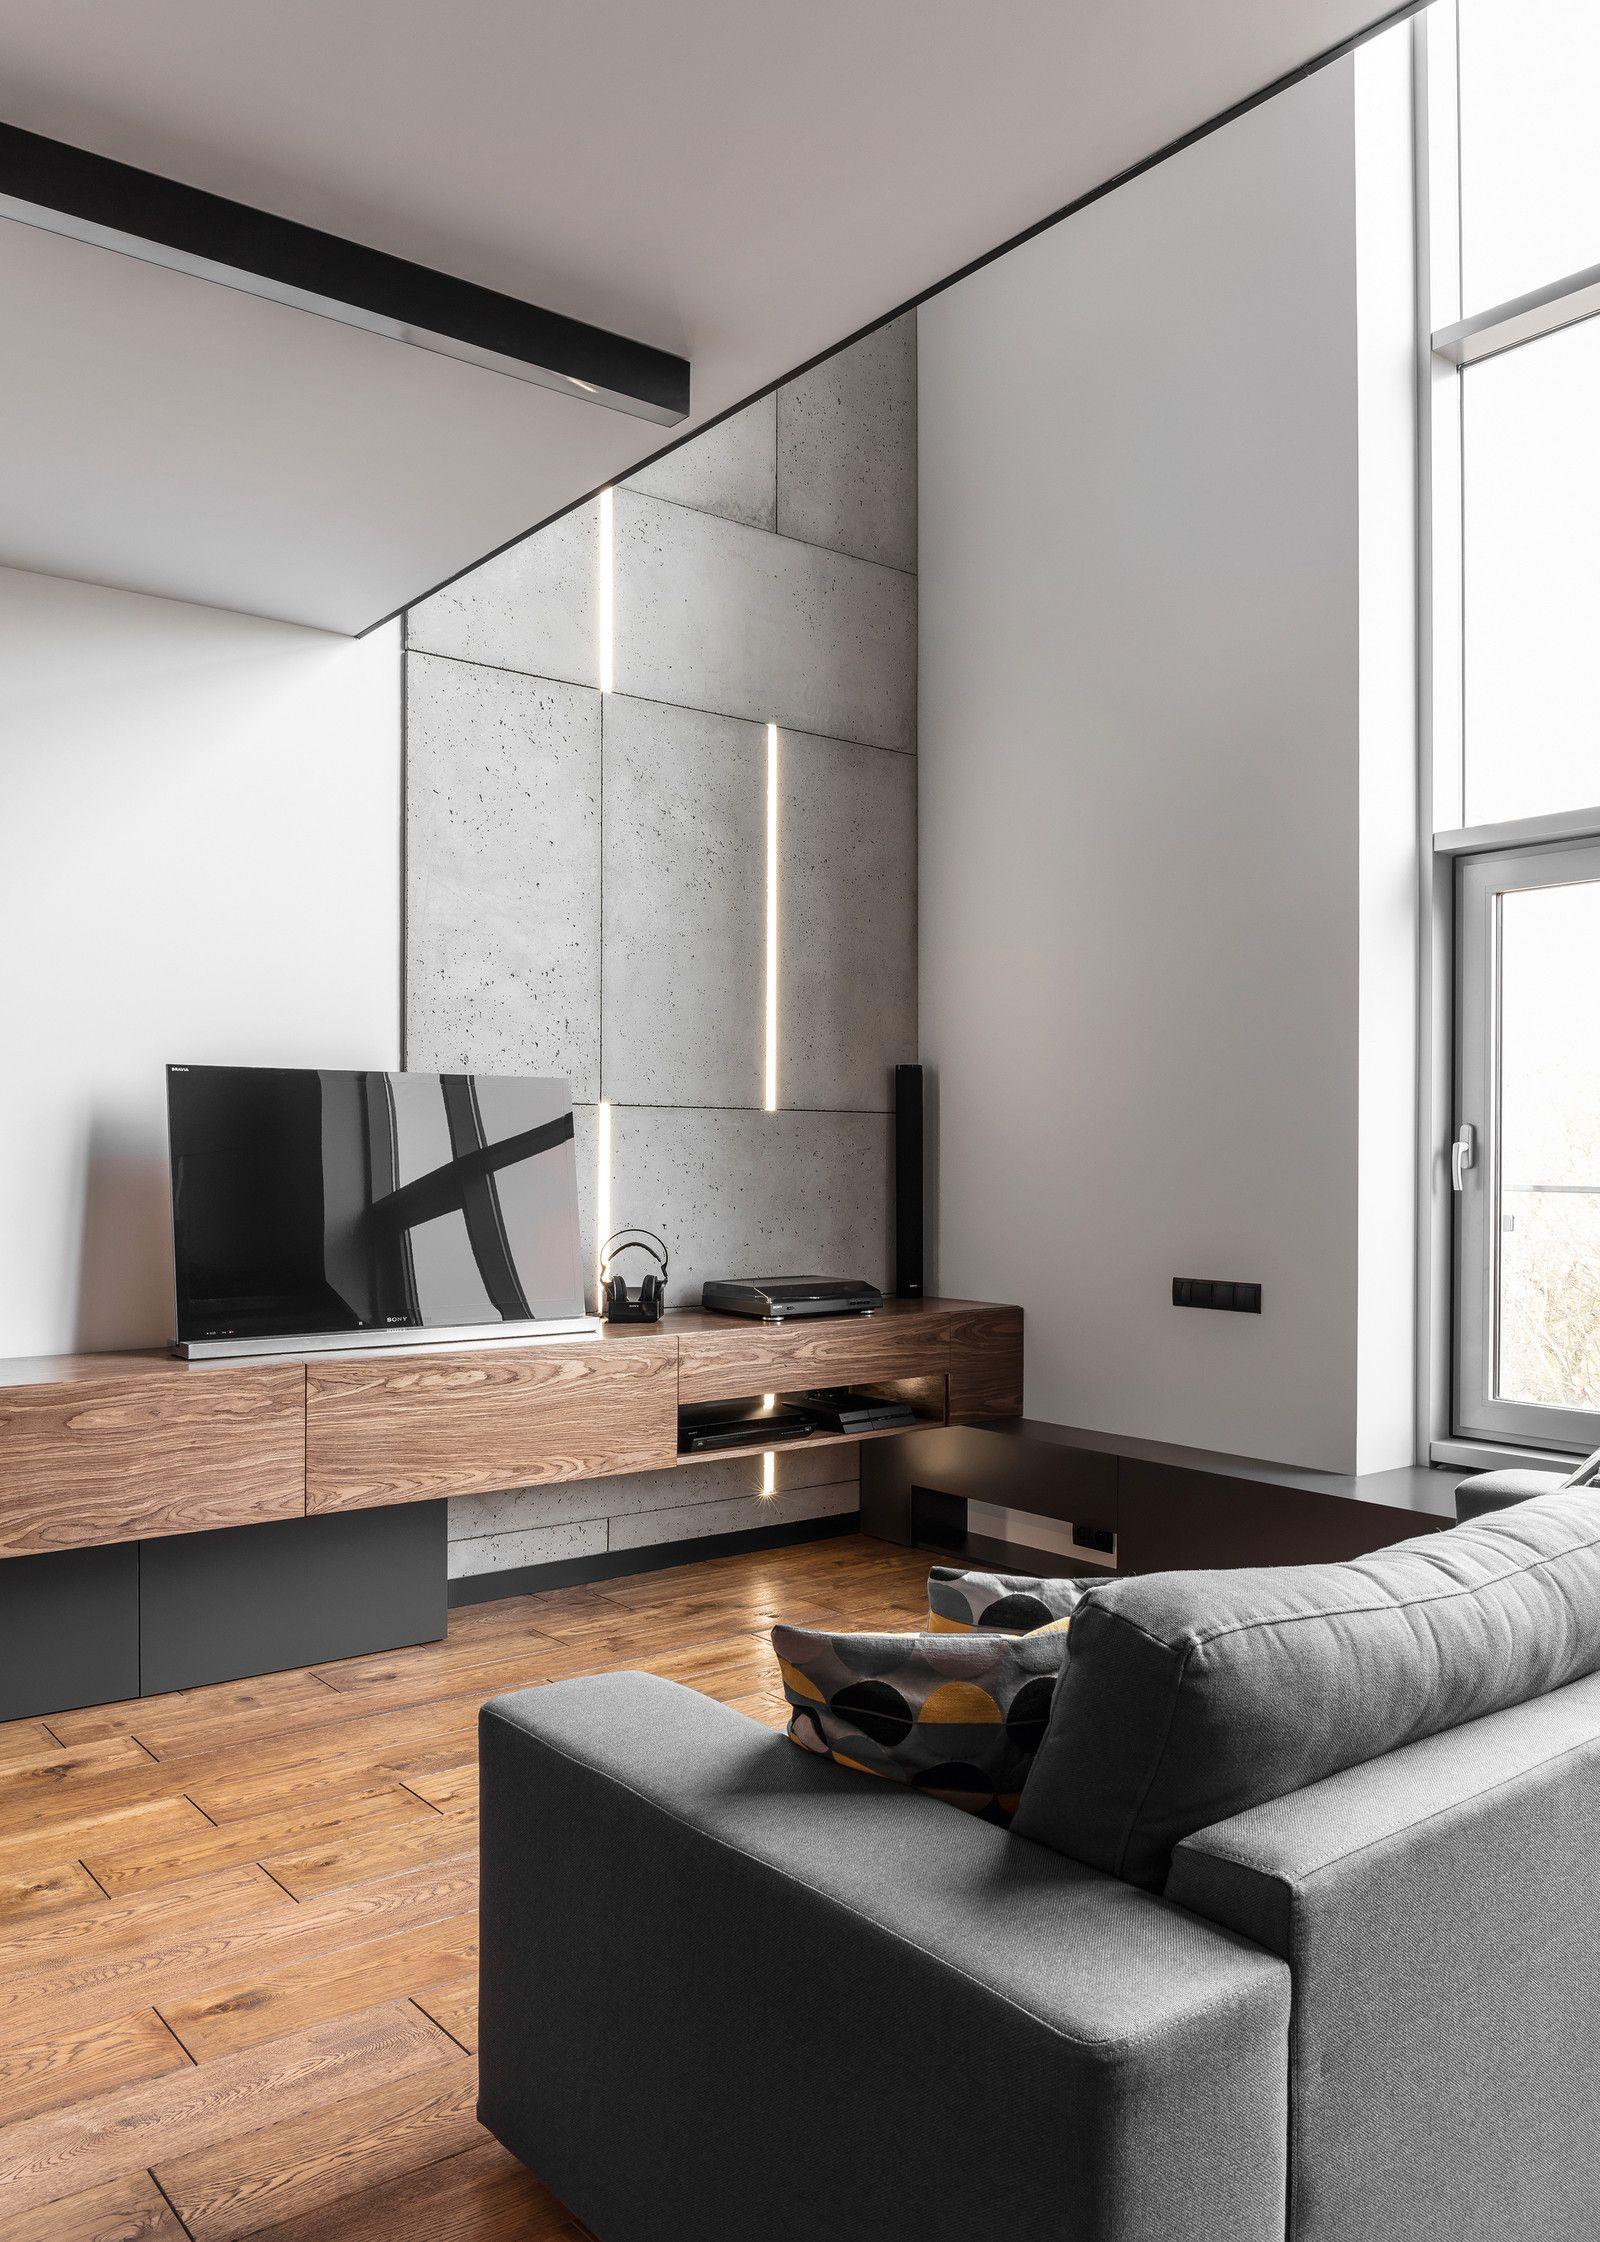 Mueble Tv Fachadas  # Muebles Moviles